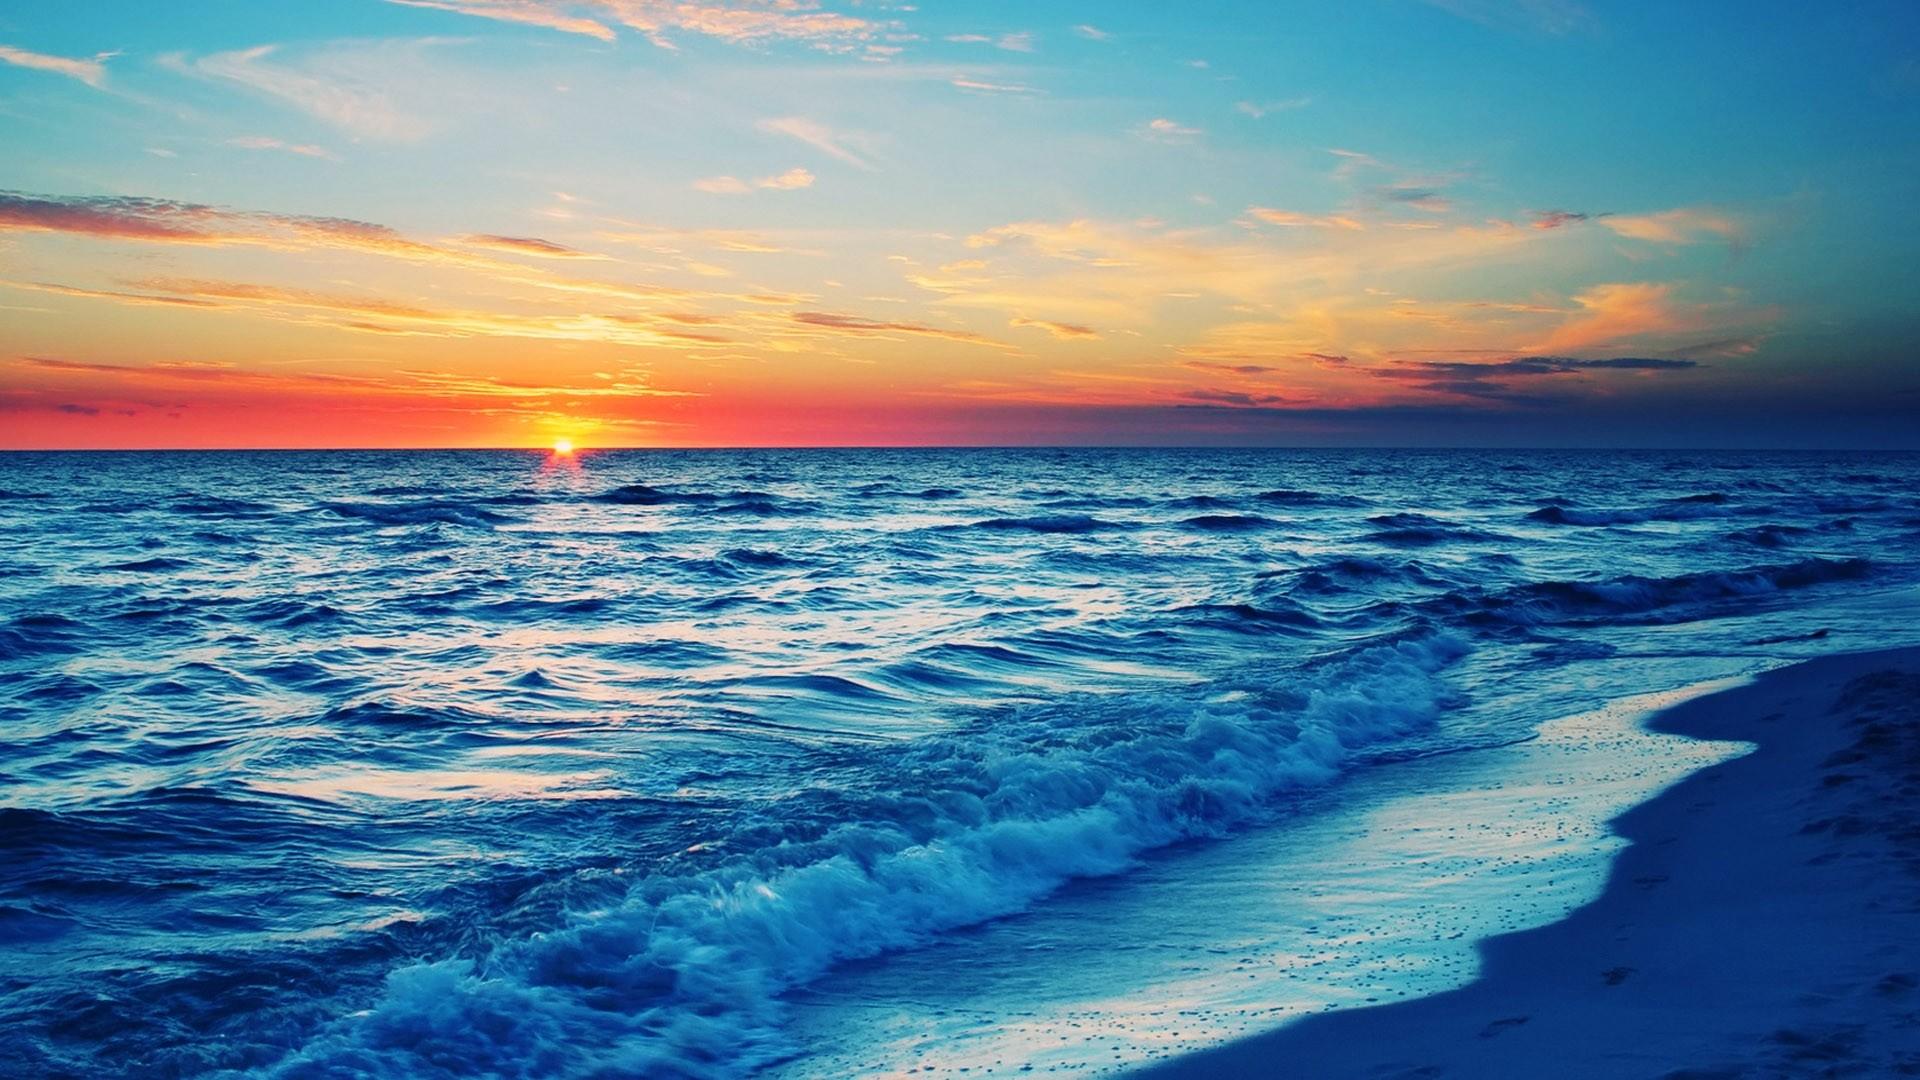 Download Wallpaper Sea, Waves, City, Night, Beach, Moon .